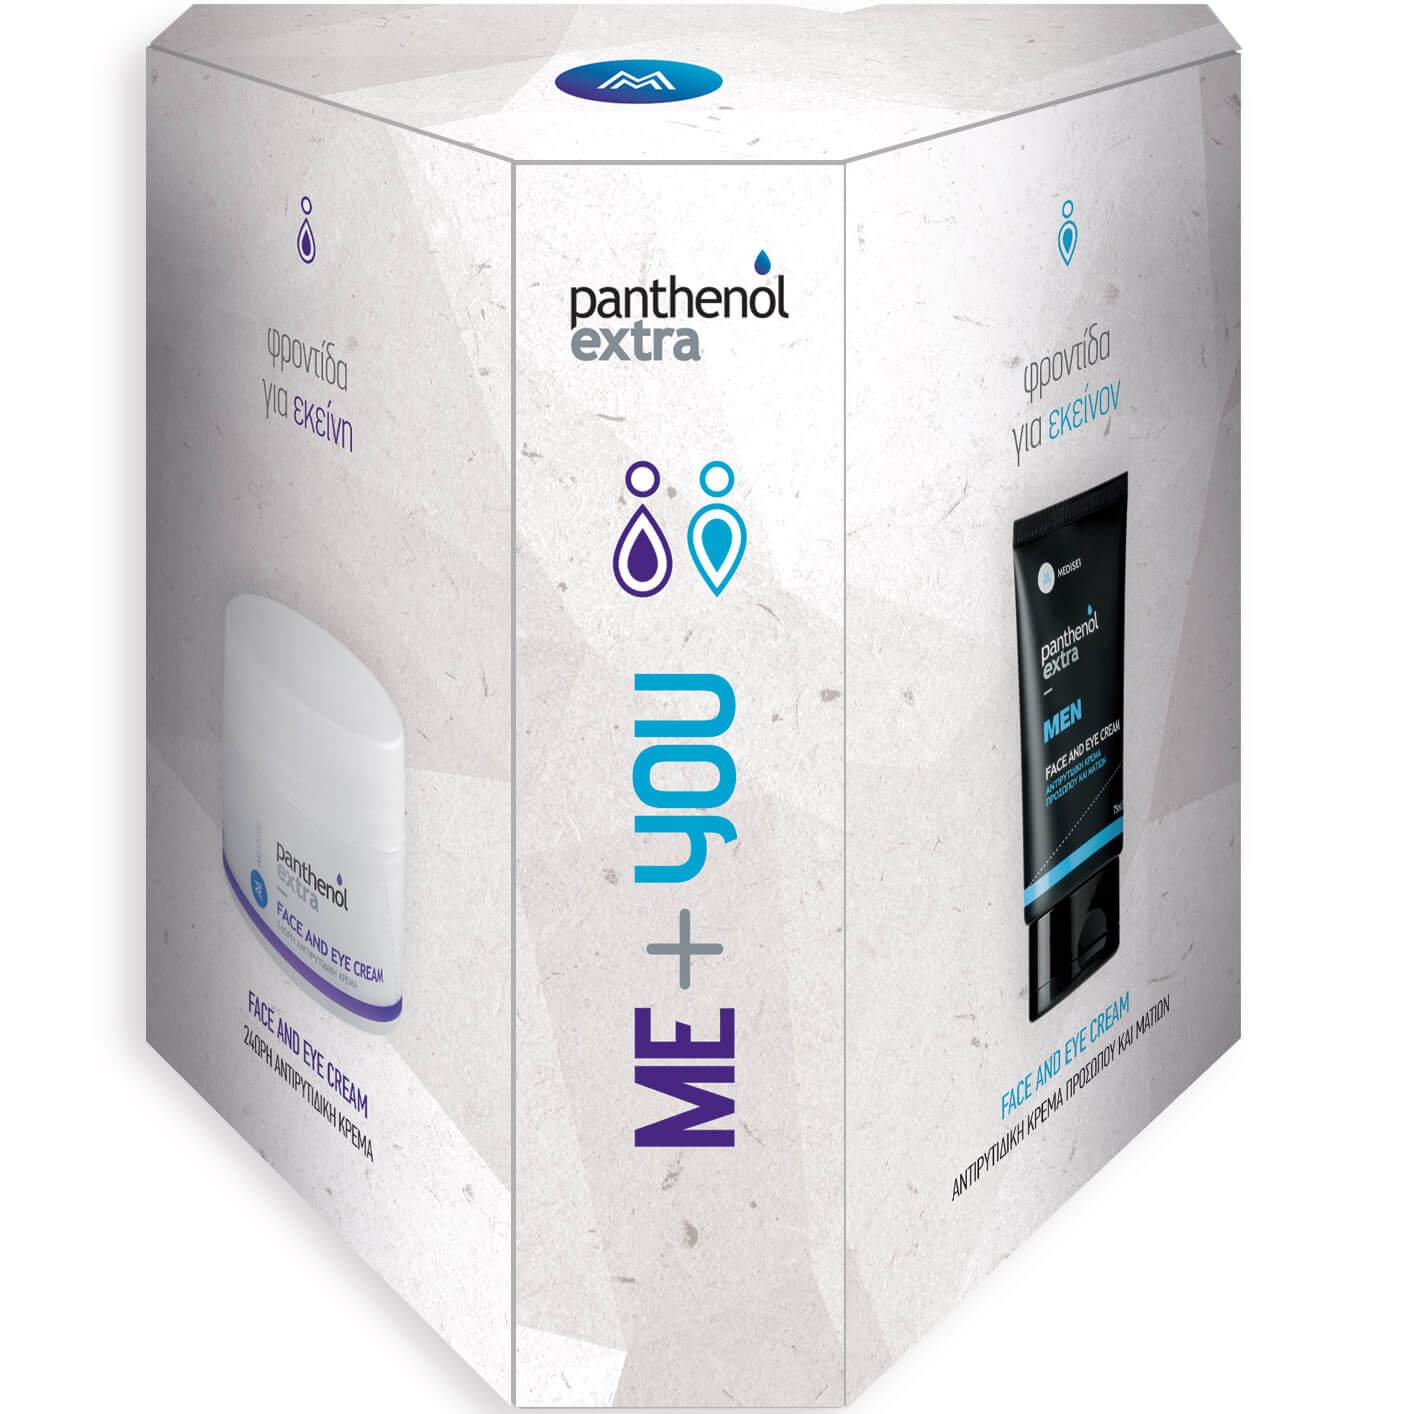 Medisei Πακέτο Προσφοράς Panthenol Extra Face And Eye Cream 50ml & Panthenol Ext ομορφιά   ανδρική φροντίδα προσώπου   σώματος   ενυδάτωση για τον άνδρα